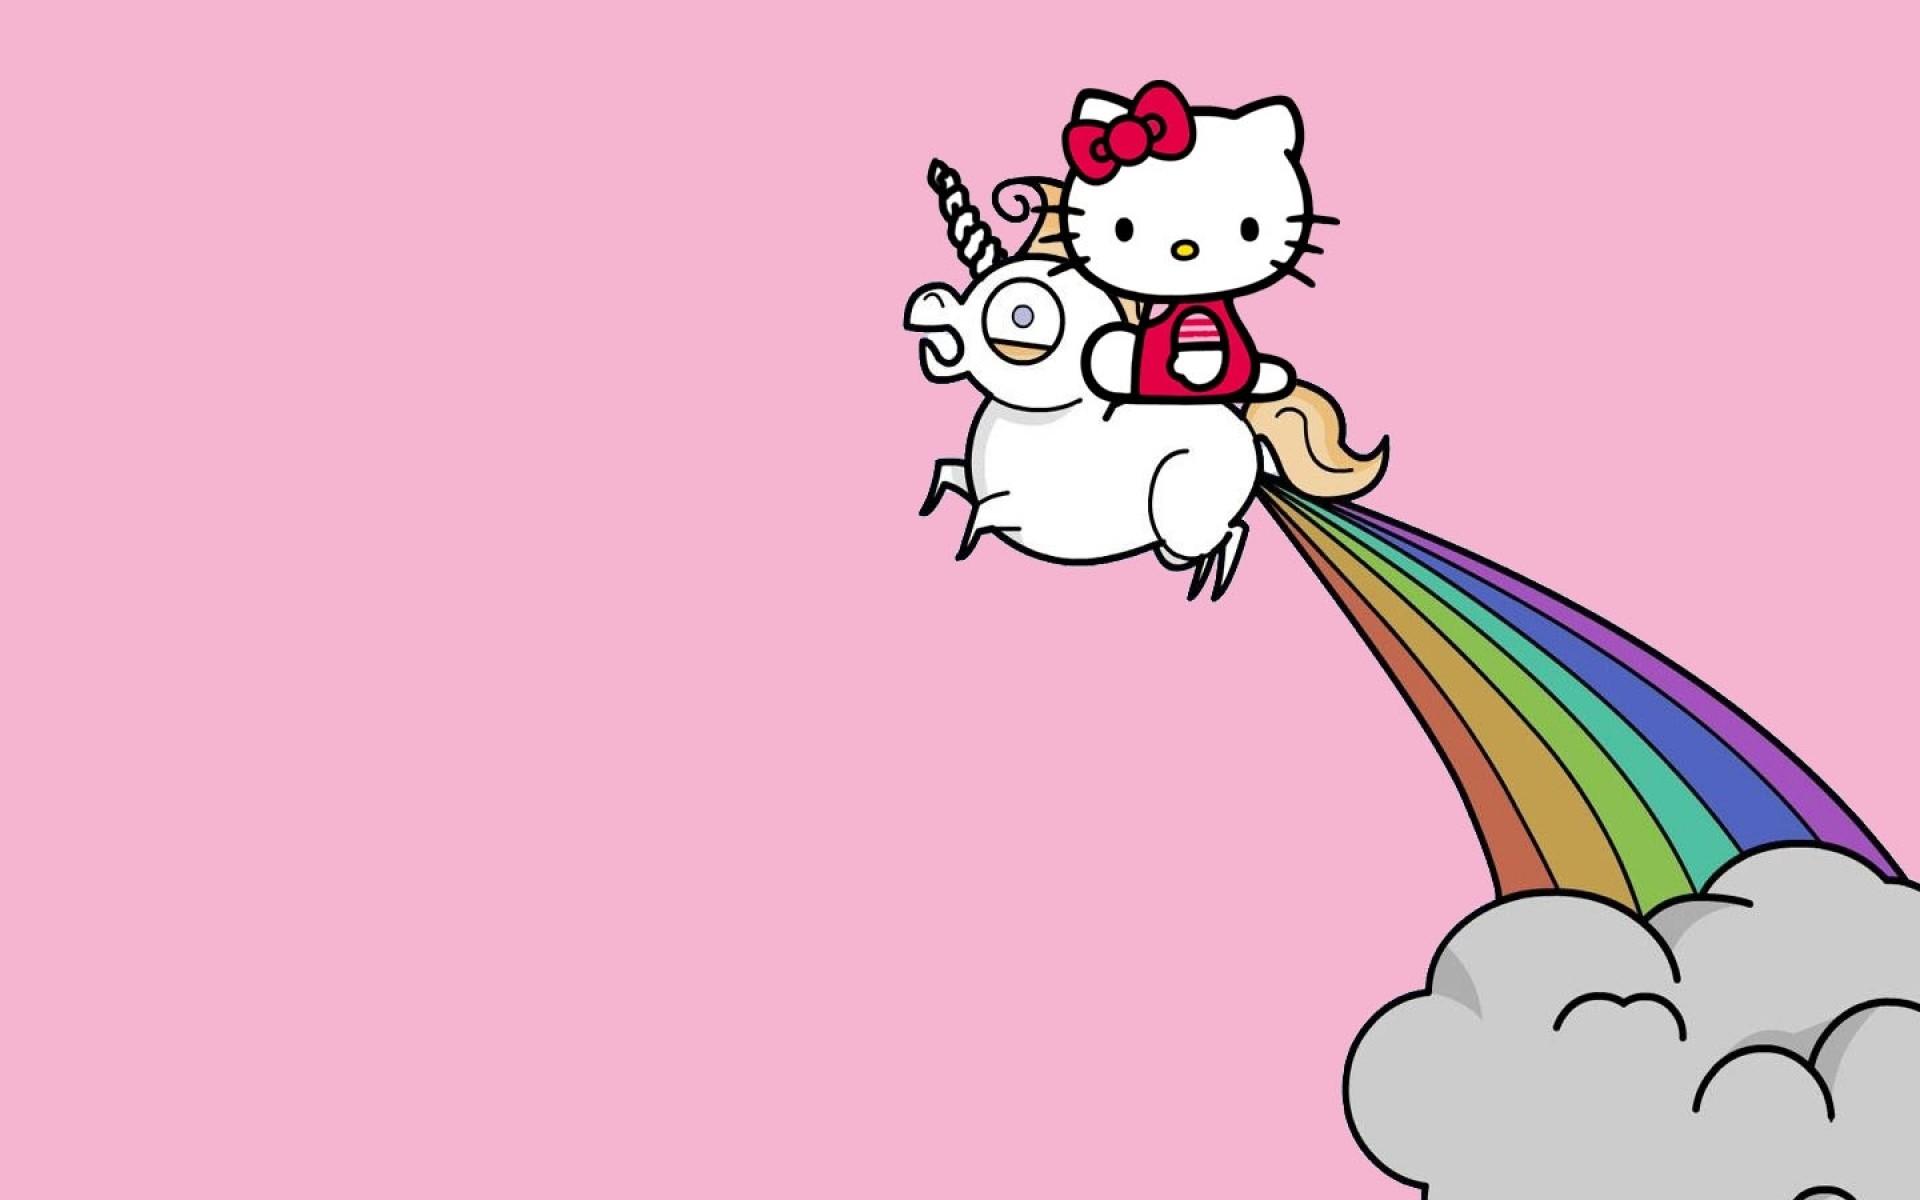 3200x1800 Wallpaperwiki Free Desktop Hello Kitty Wallpapers Images